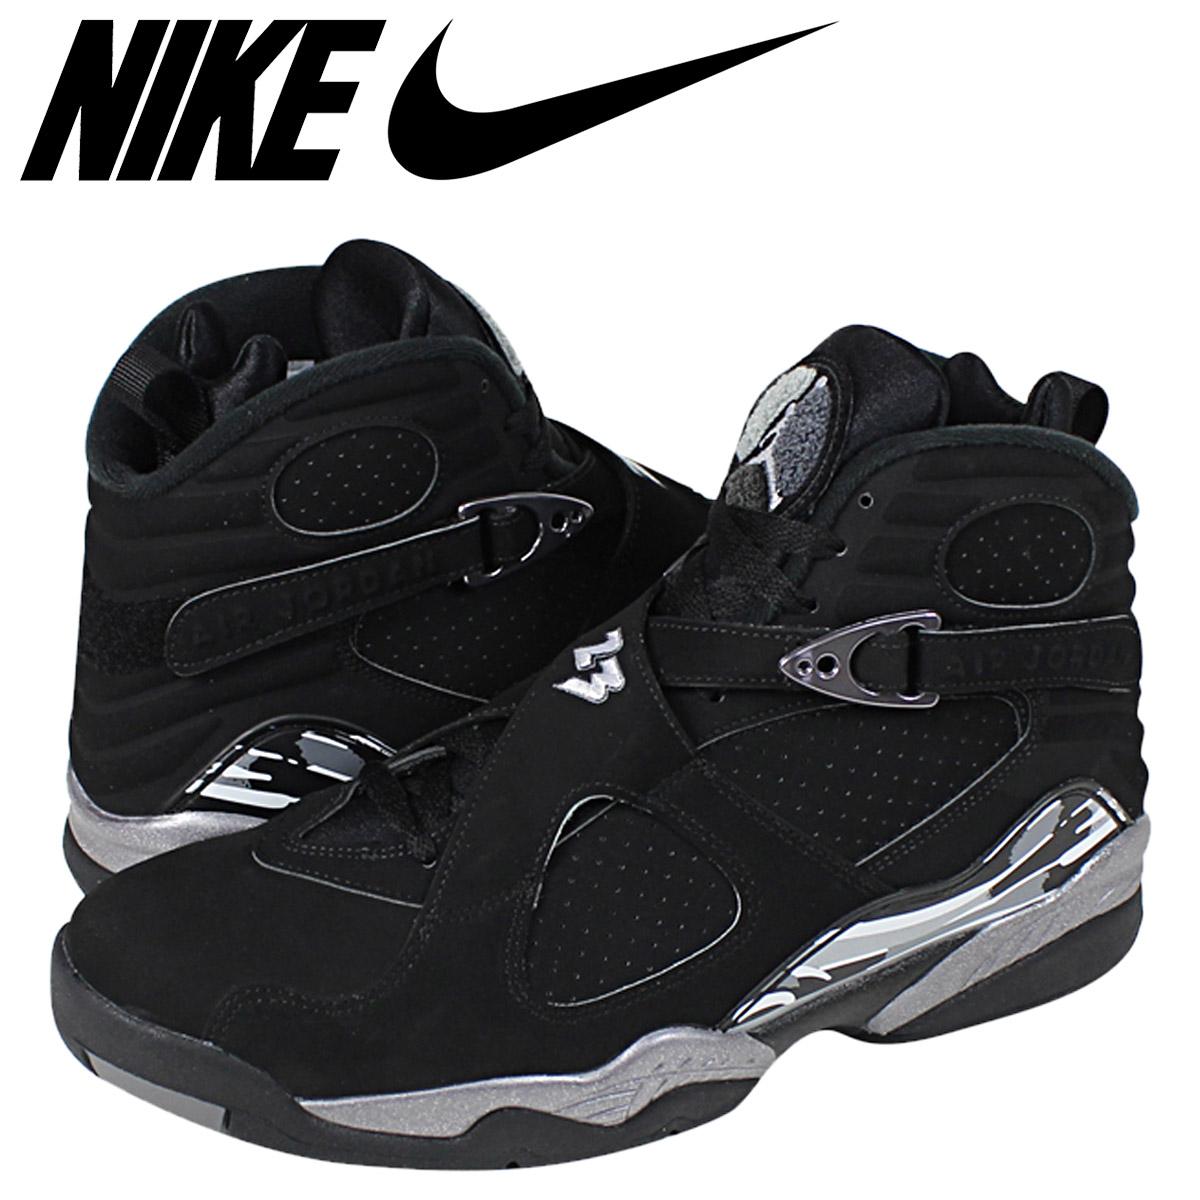 buy popular aaa39 be638 Nike NIKE Air Jordan sneakers AIR JORDAN 8 RETRO CHROME Air Jordan 8 Retro  chrome 305381-003 black mens